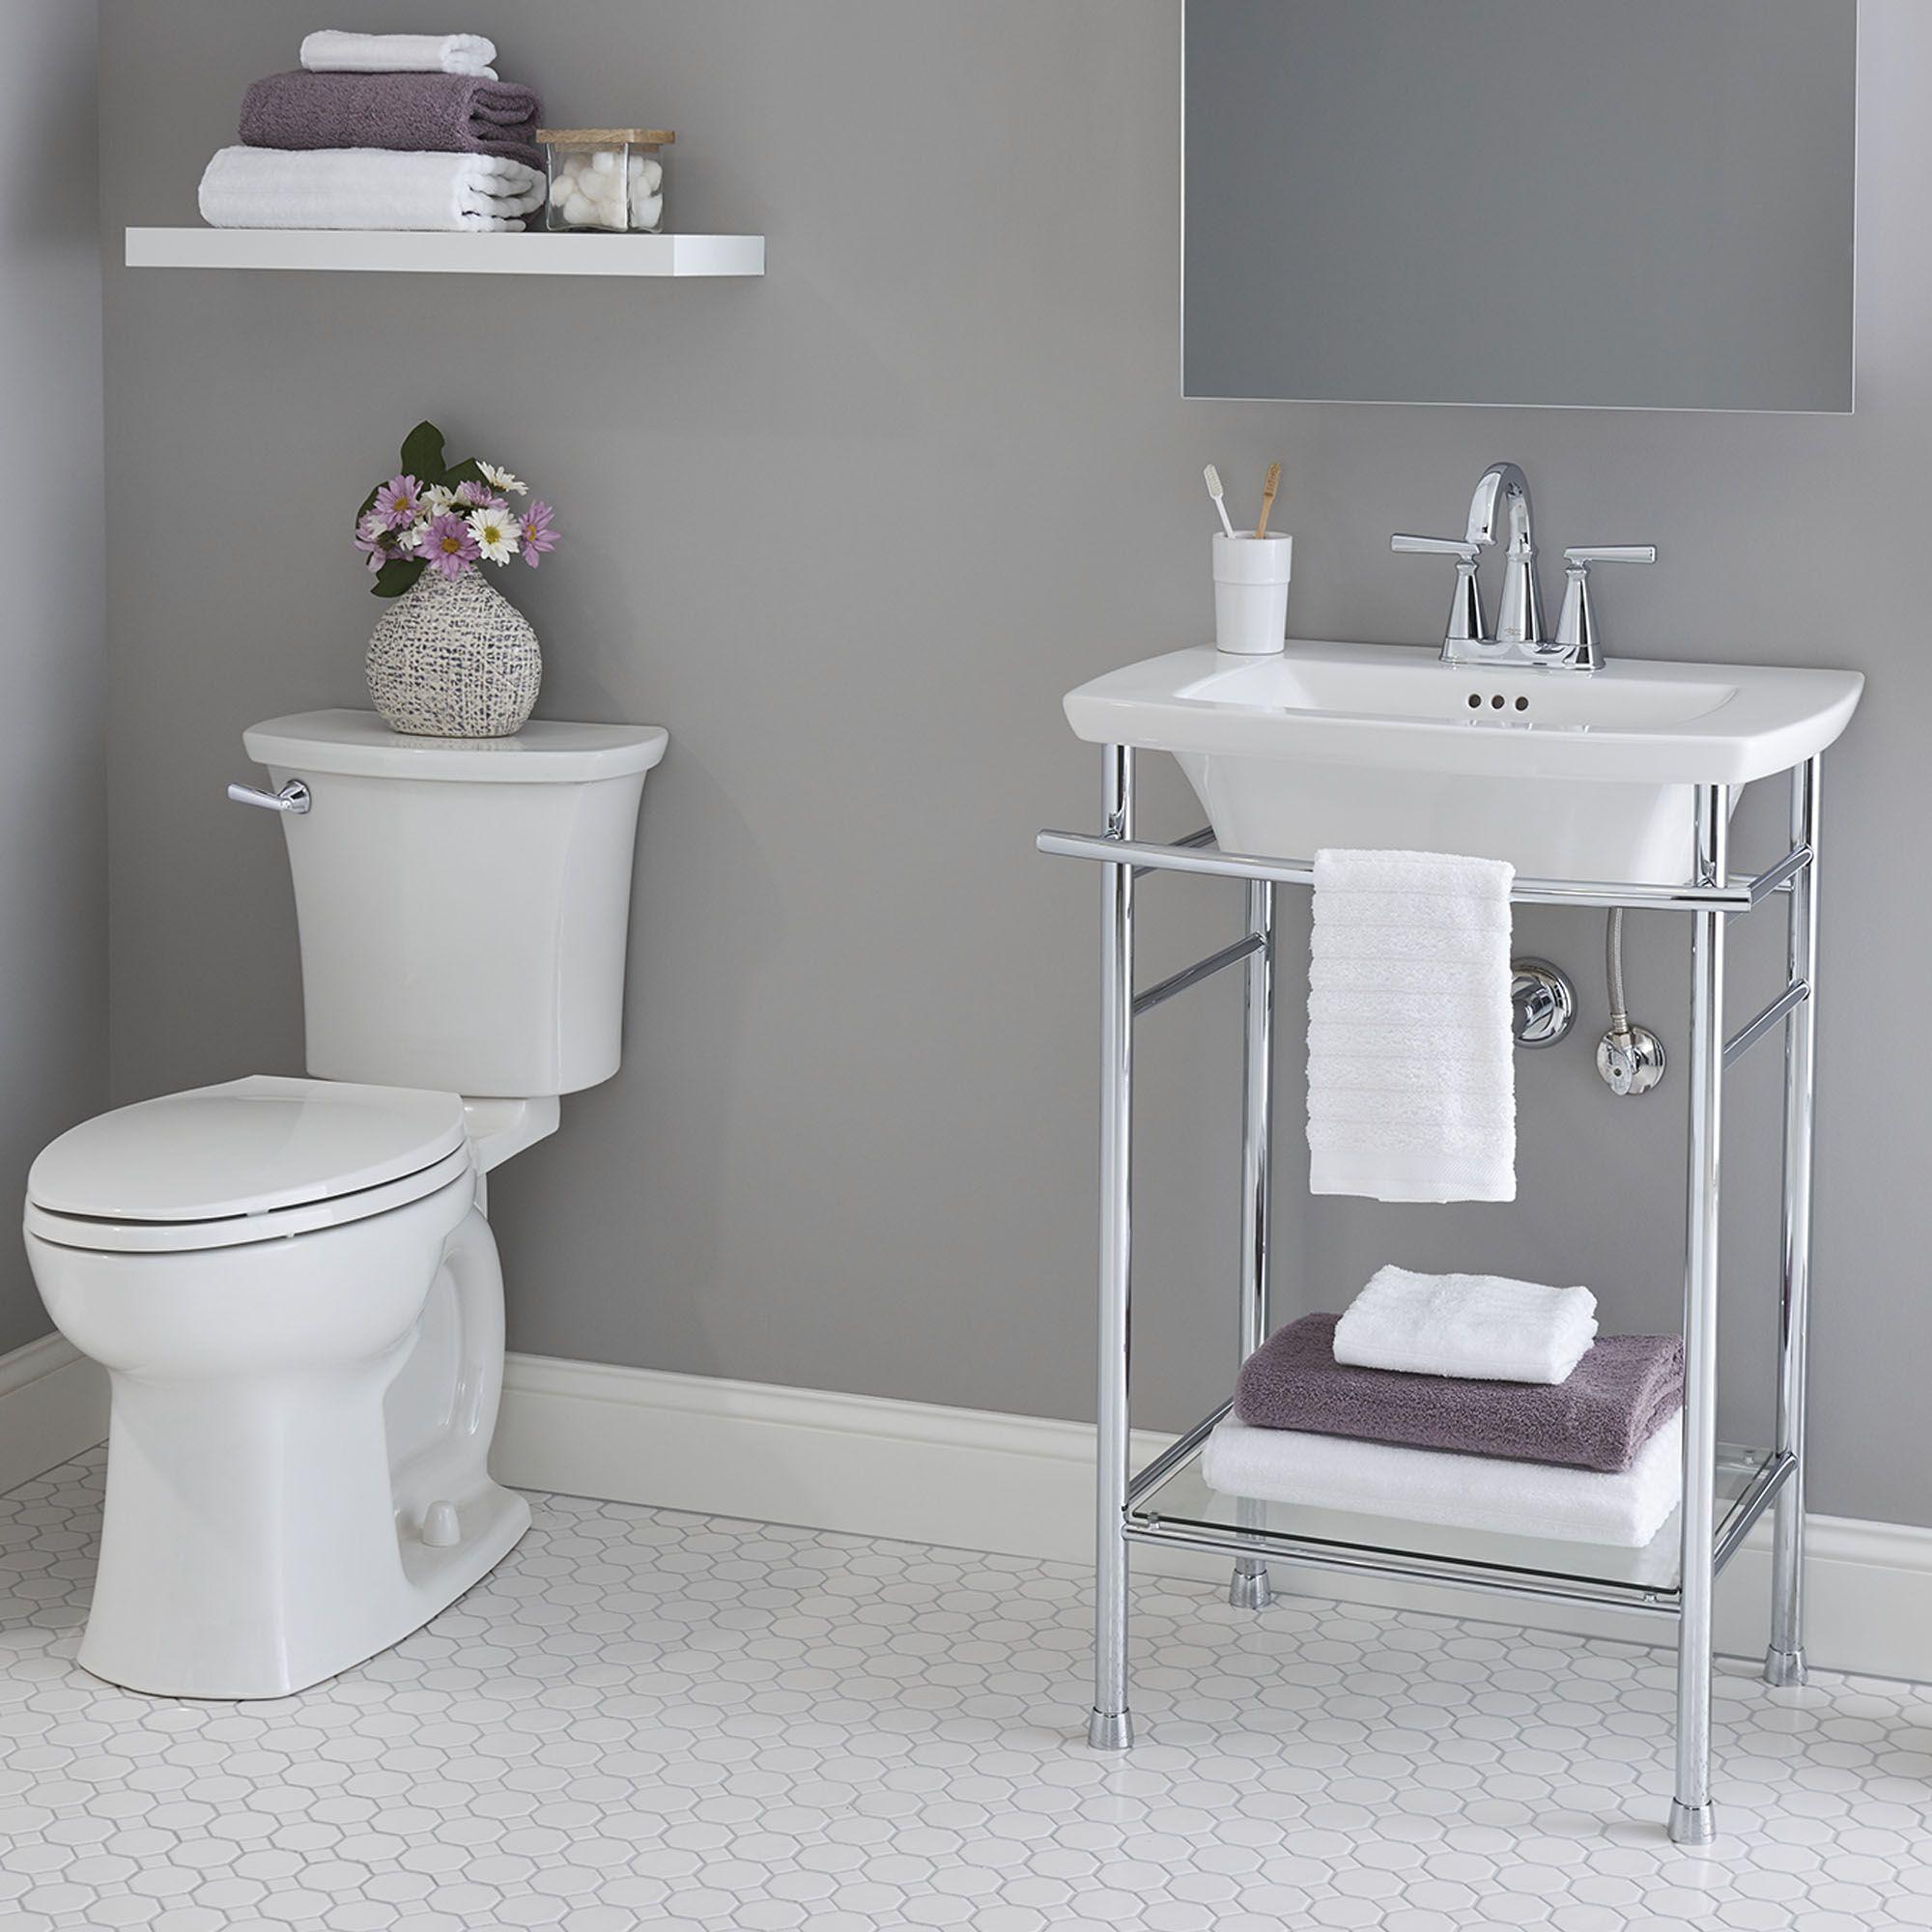 American Standard Edgemere 2 Handle 4 In Centerset Bathroom Faucet